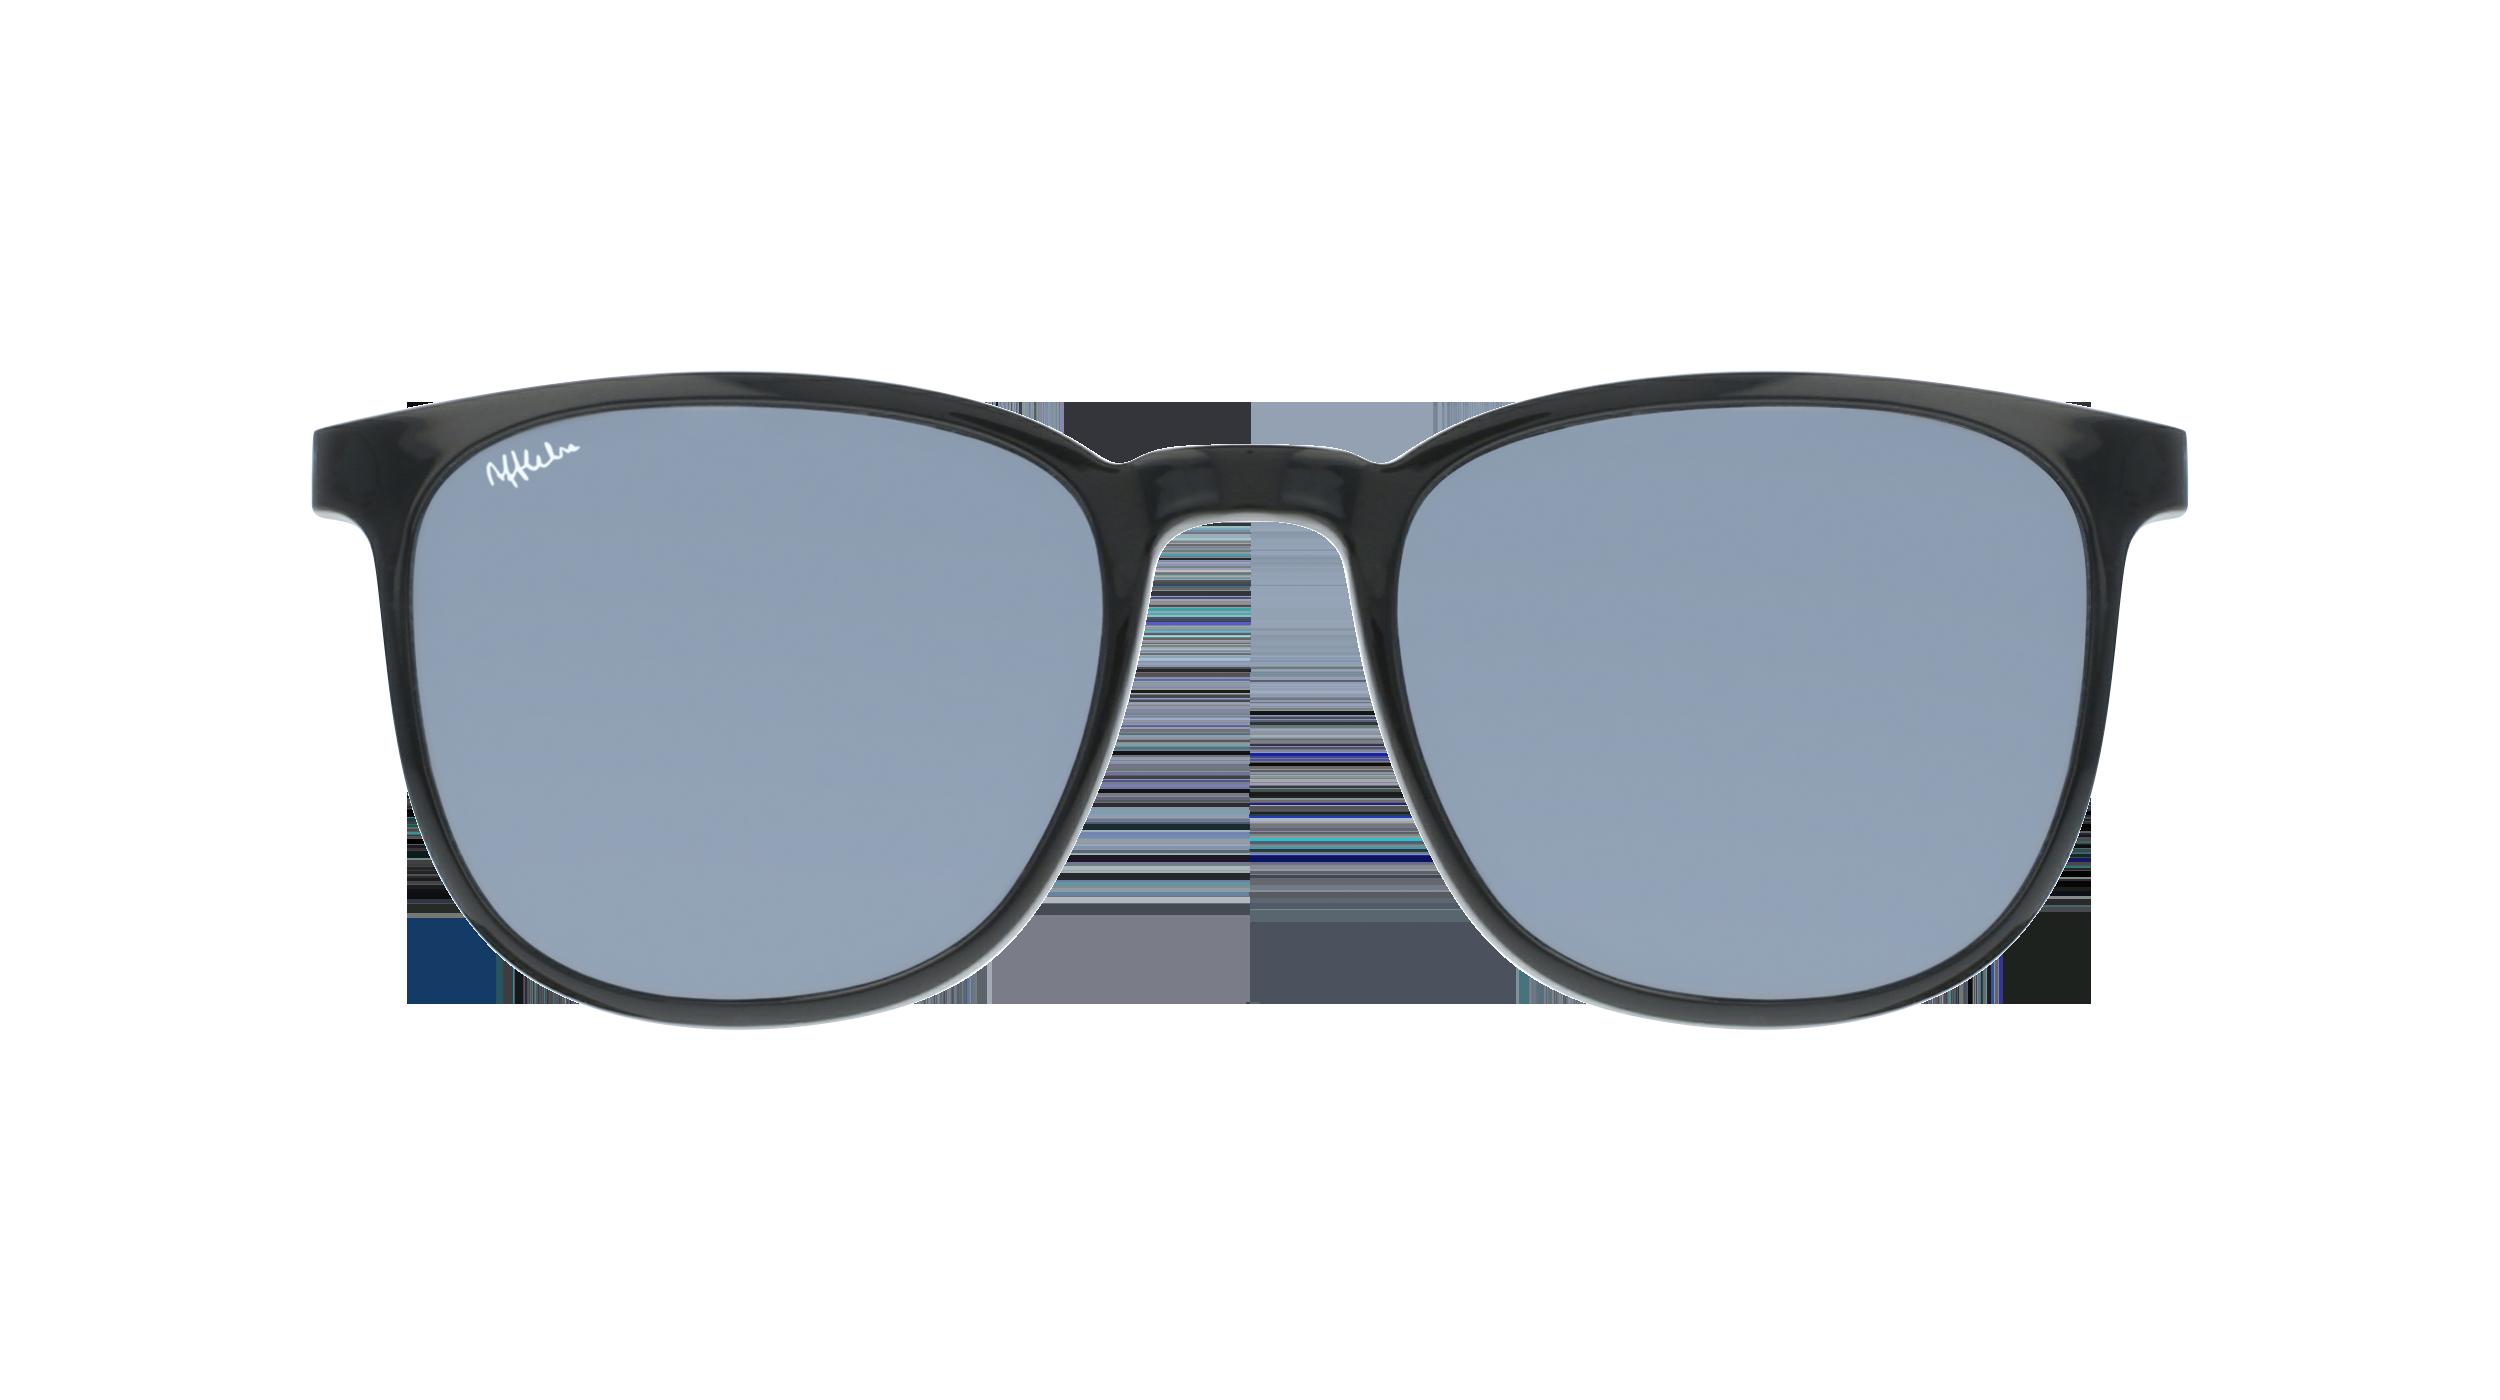 afflelou/france/products/smart_clip/clips_glasses/07630036457313.png